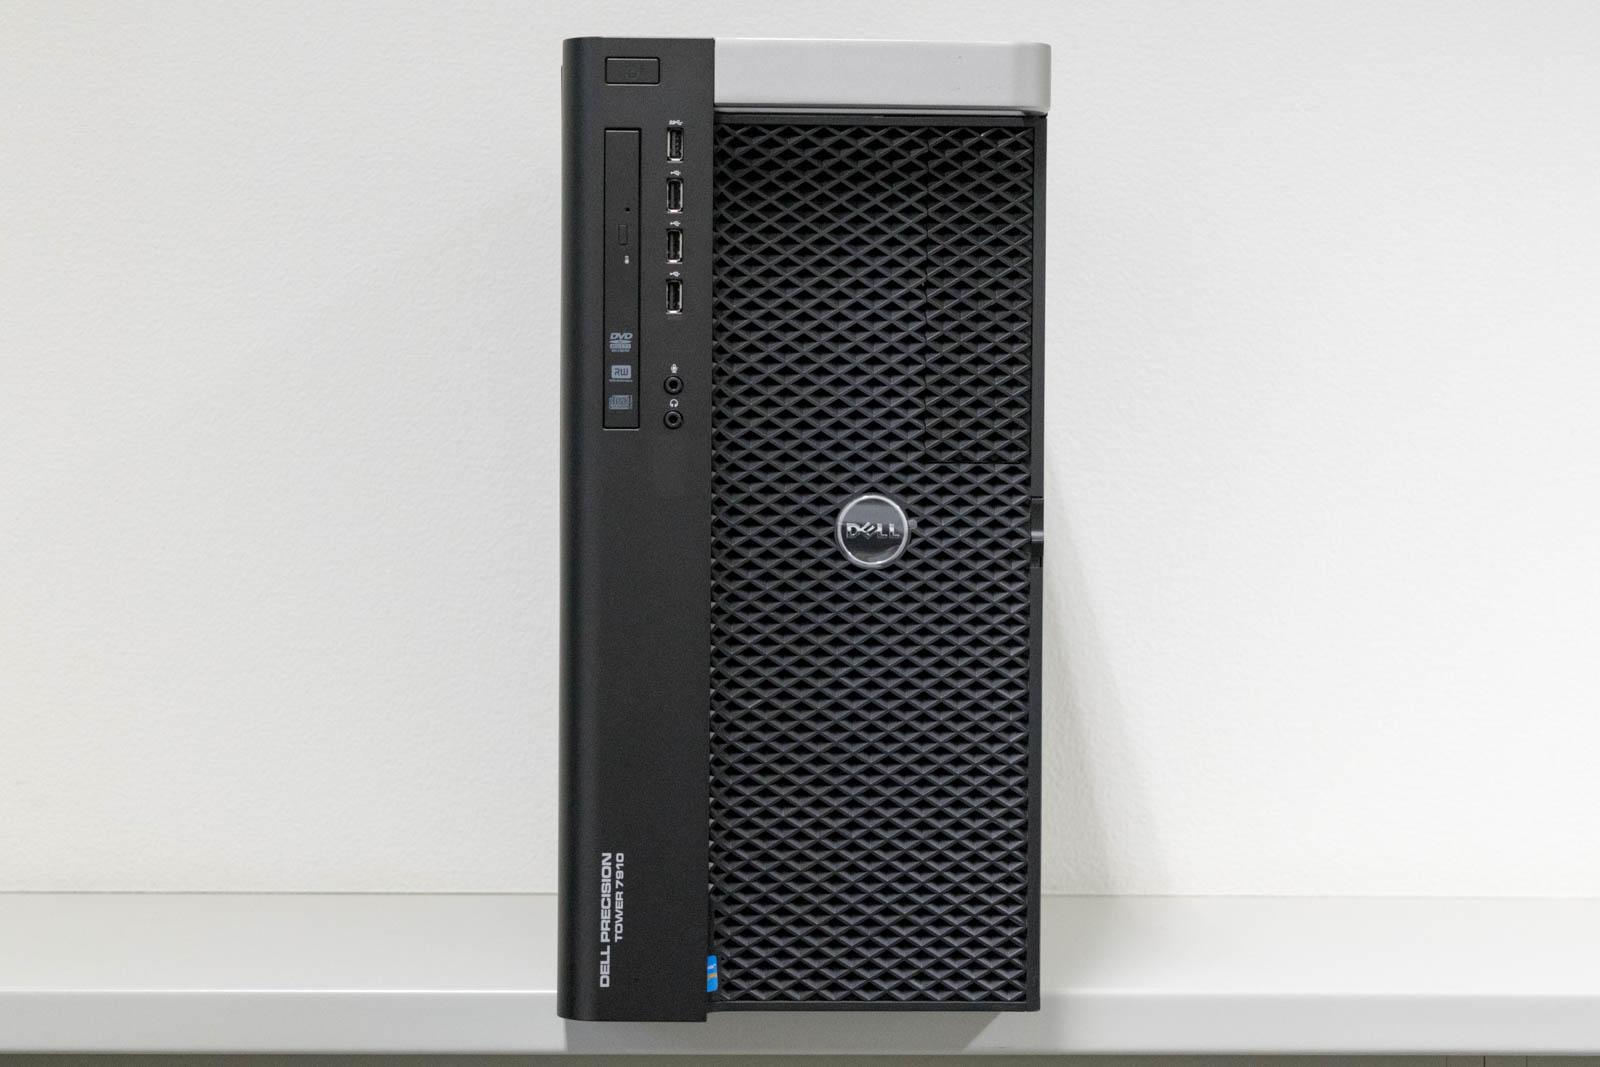 DELL Precision Tower 7910 Xeon E5-2697 v3 x2, メモリ64GB(8GBx8), NVIDIA Quadro K620 2GB, Windows 8.1 Pro 64bit, 256 SSD + 1TB HDDx1【中古】